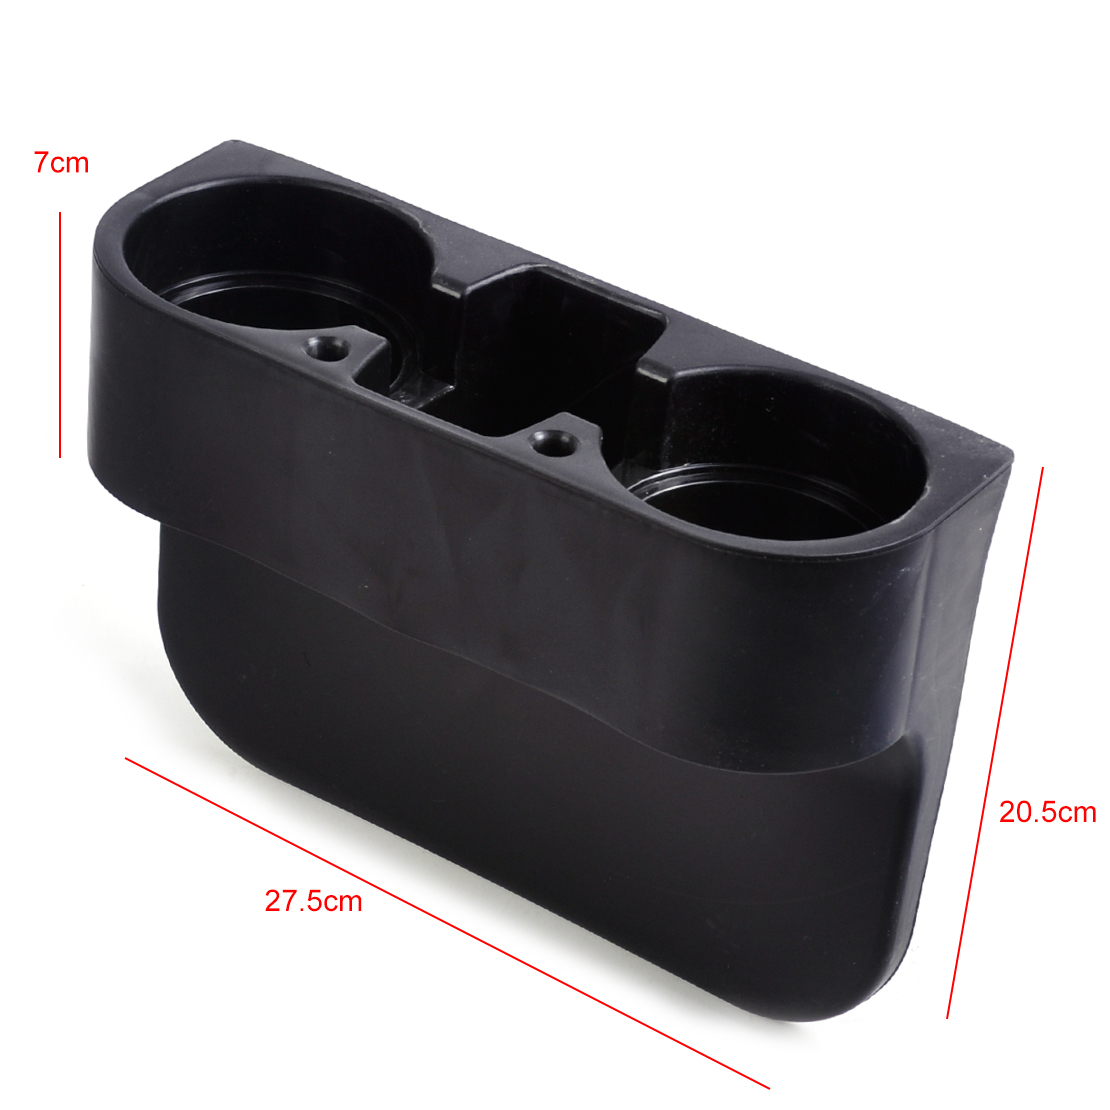 universal black car seat seam wedge cup drink holder mobile shelf content box ebay. Black Bedroom Furniture Sets. Home Design Ideas